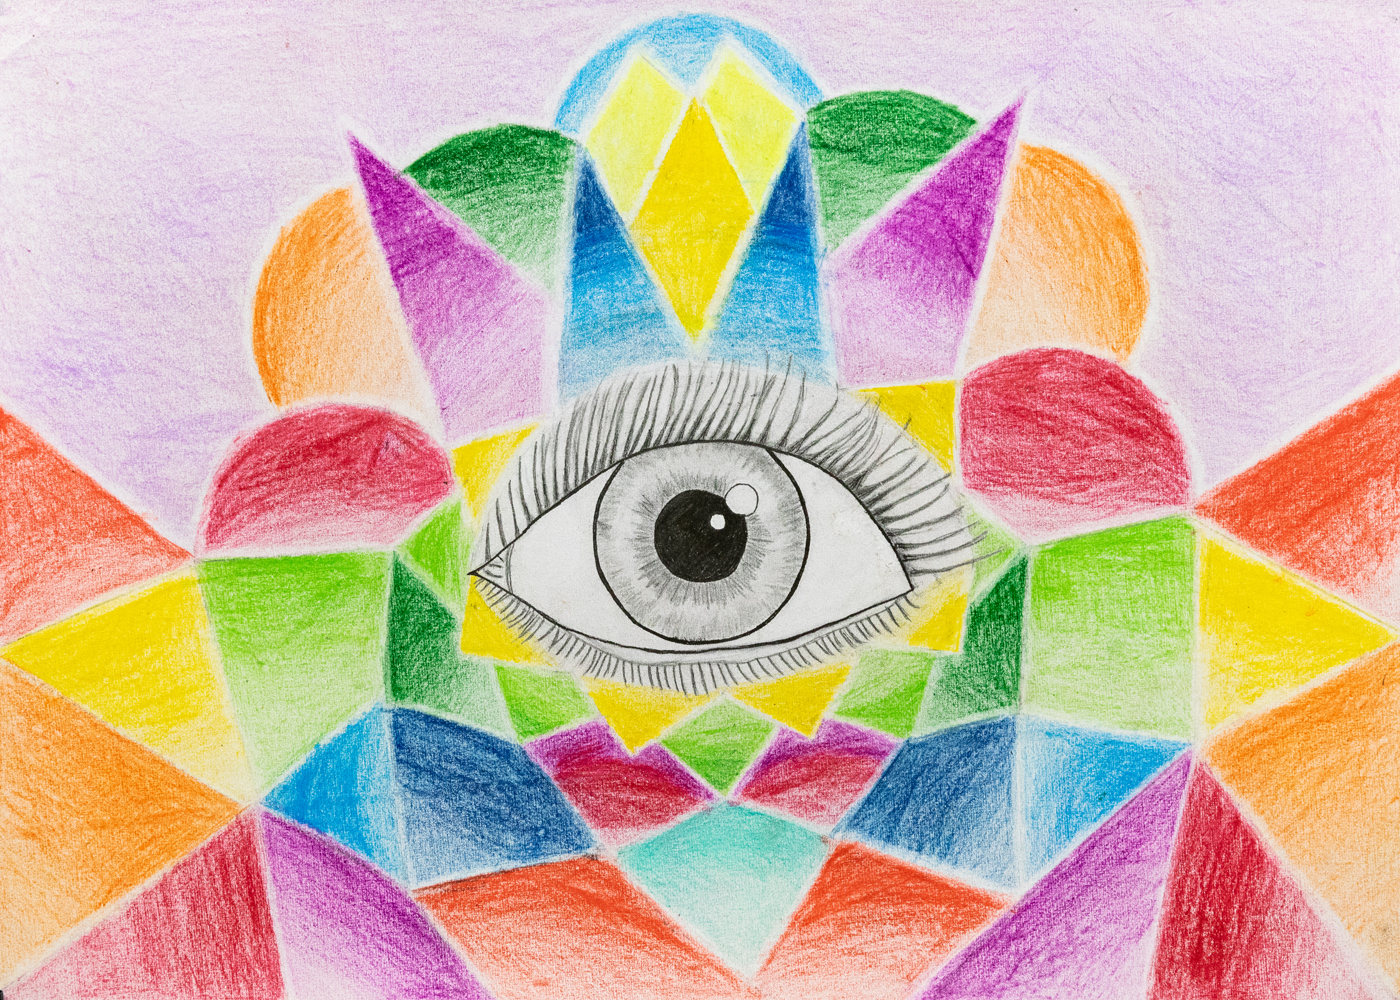 29. Qynn Stamer, 'Seeing through the rainbow', pencil, pen, Year 4, Home School